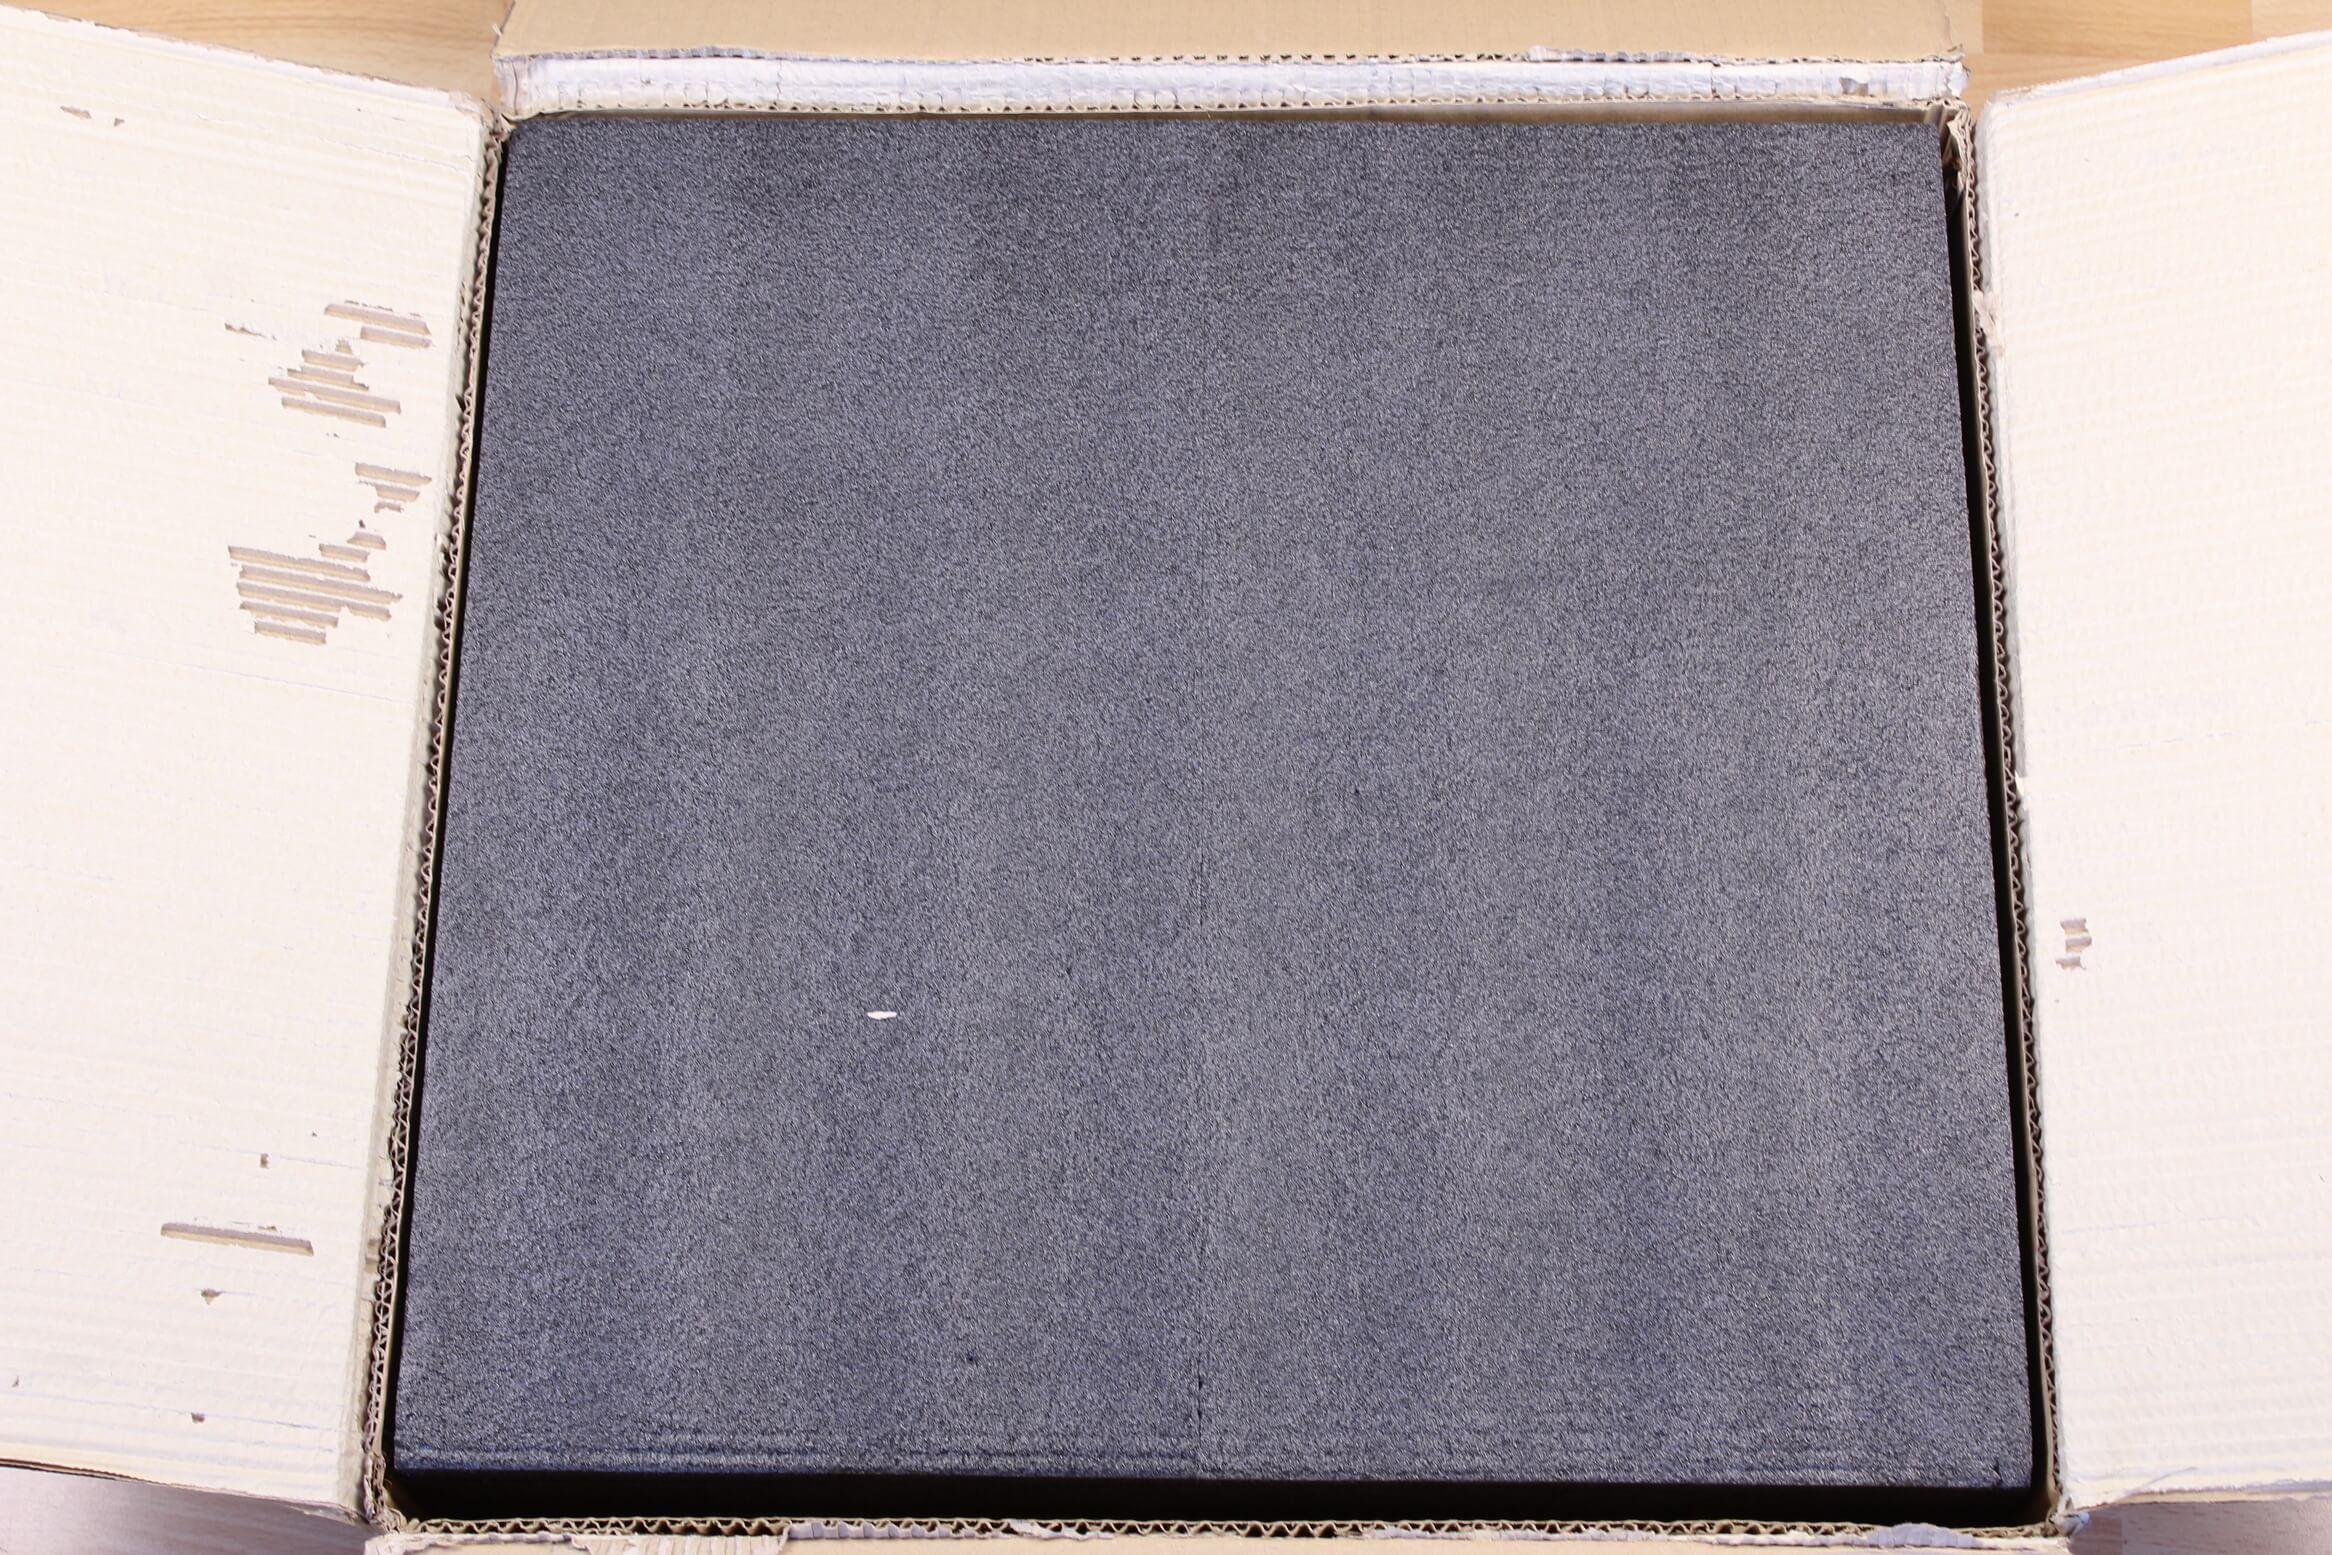 BIQU-BX-Packaging-3